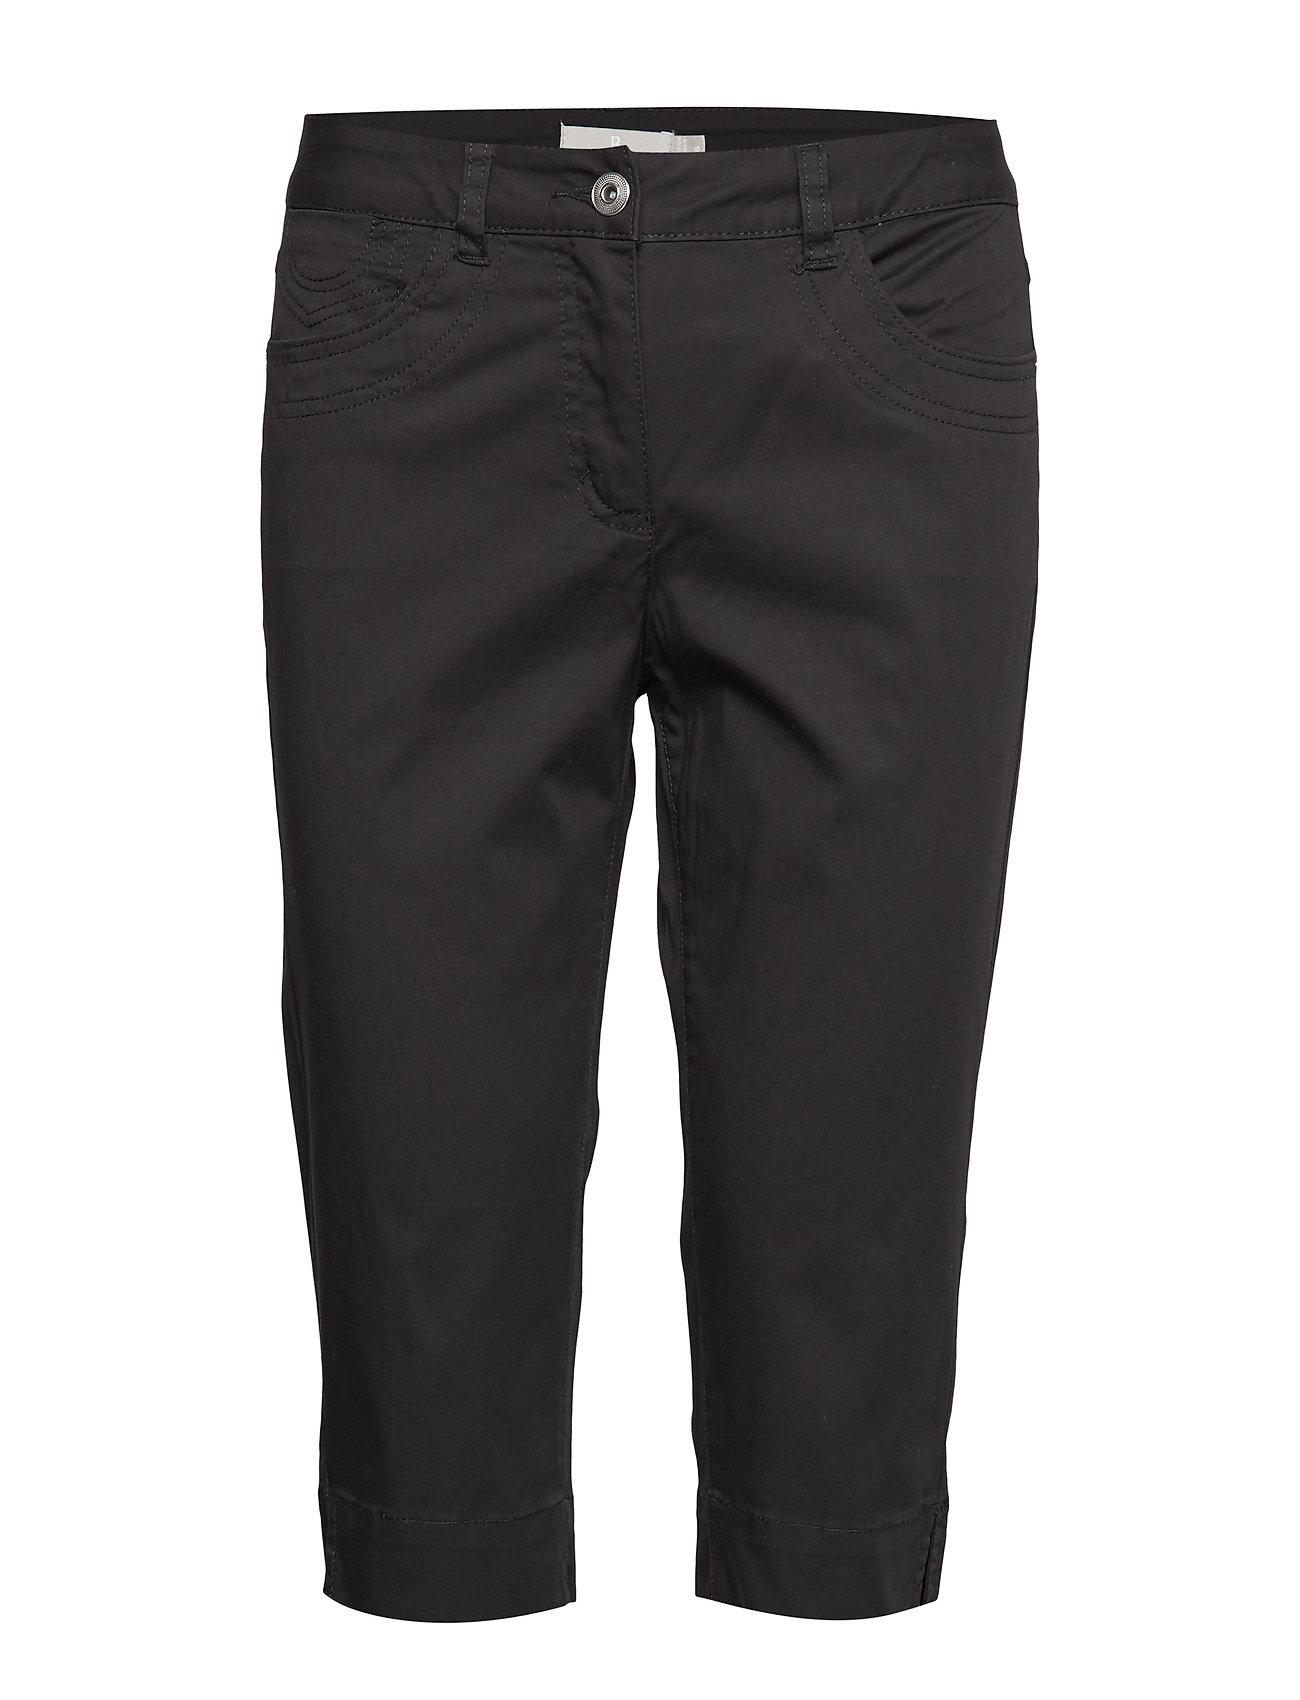 Brandtex Capri pants